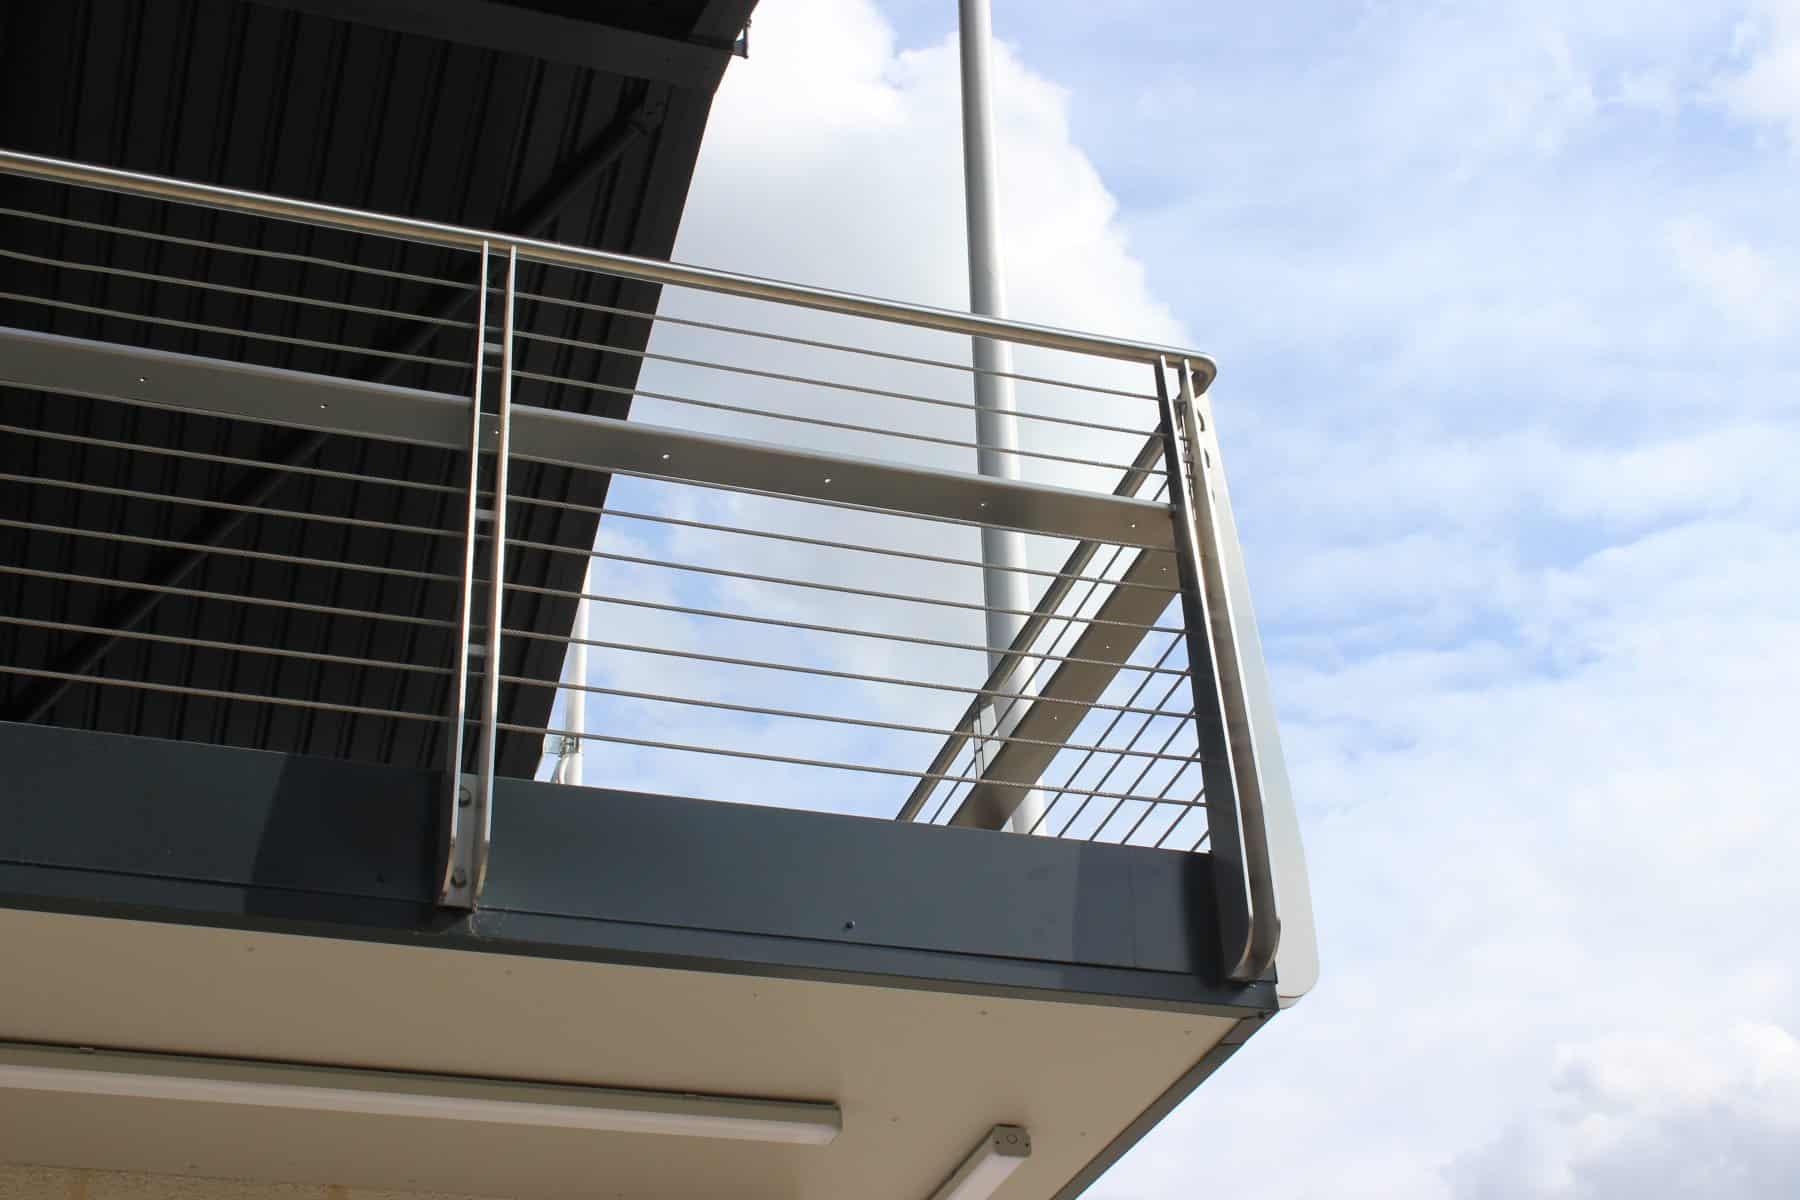 Balcony Railings City Of Cambridge Rowing Club Balcony Looking To Sky Wrightfield Ltd